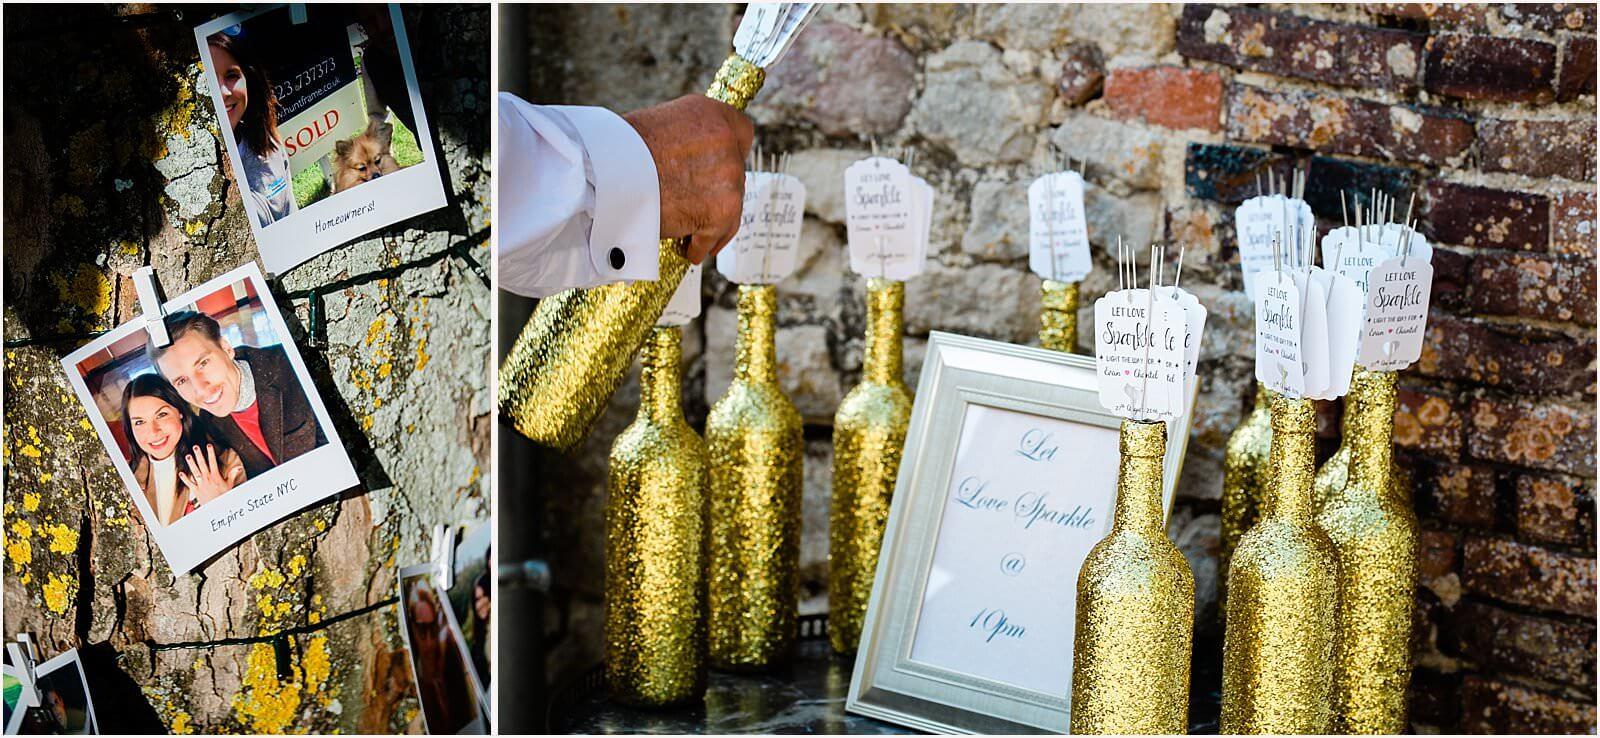 Chateau de Courtomer Wedding | Chantel & Evan 51